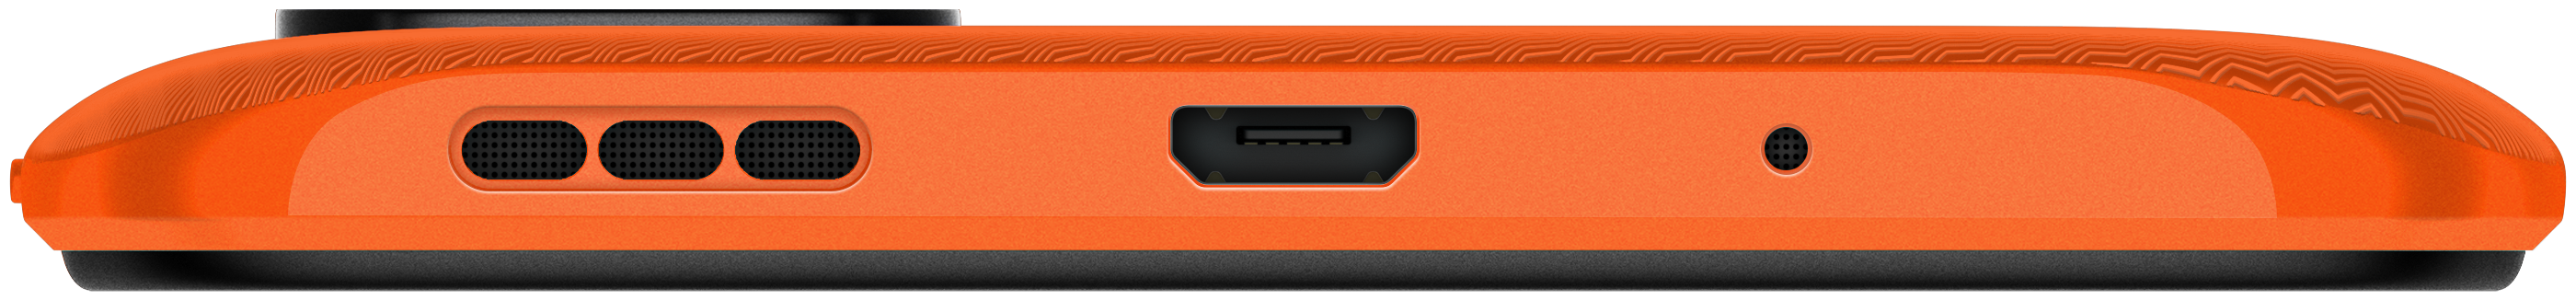 Xiaomi Redmi 9C 3/64GB (NFC) - беспроводные интерфейсы: NFC, Wi-Fi, Bluetooth 5.0